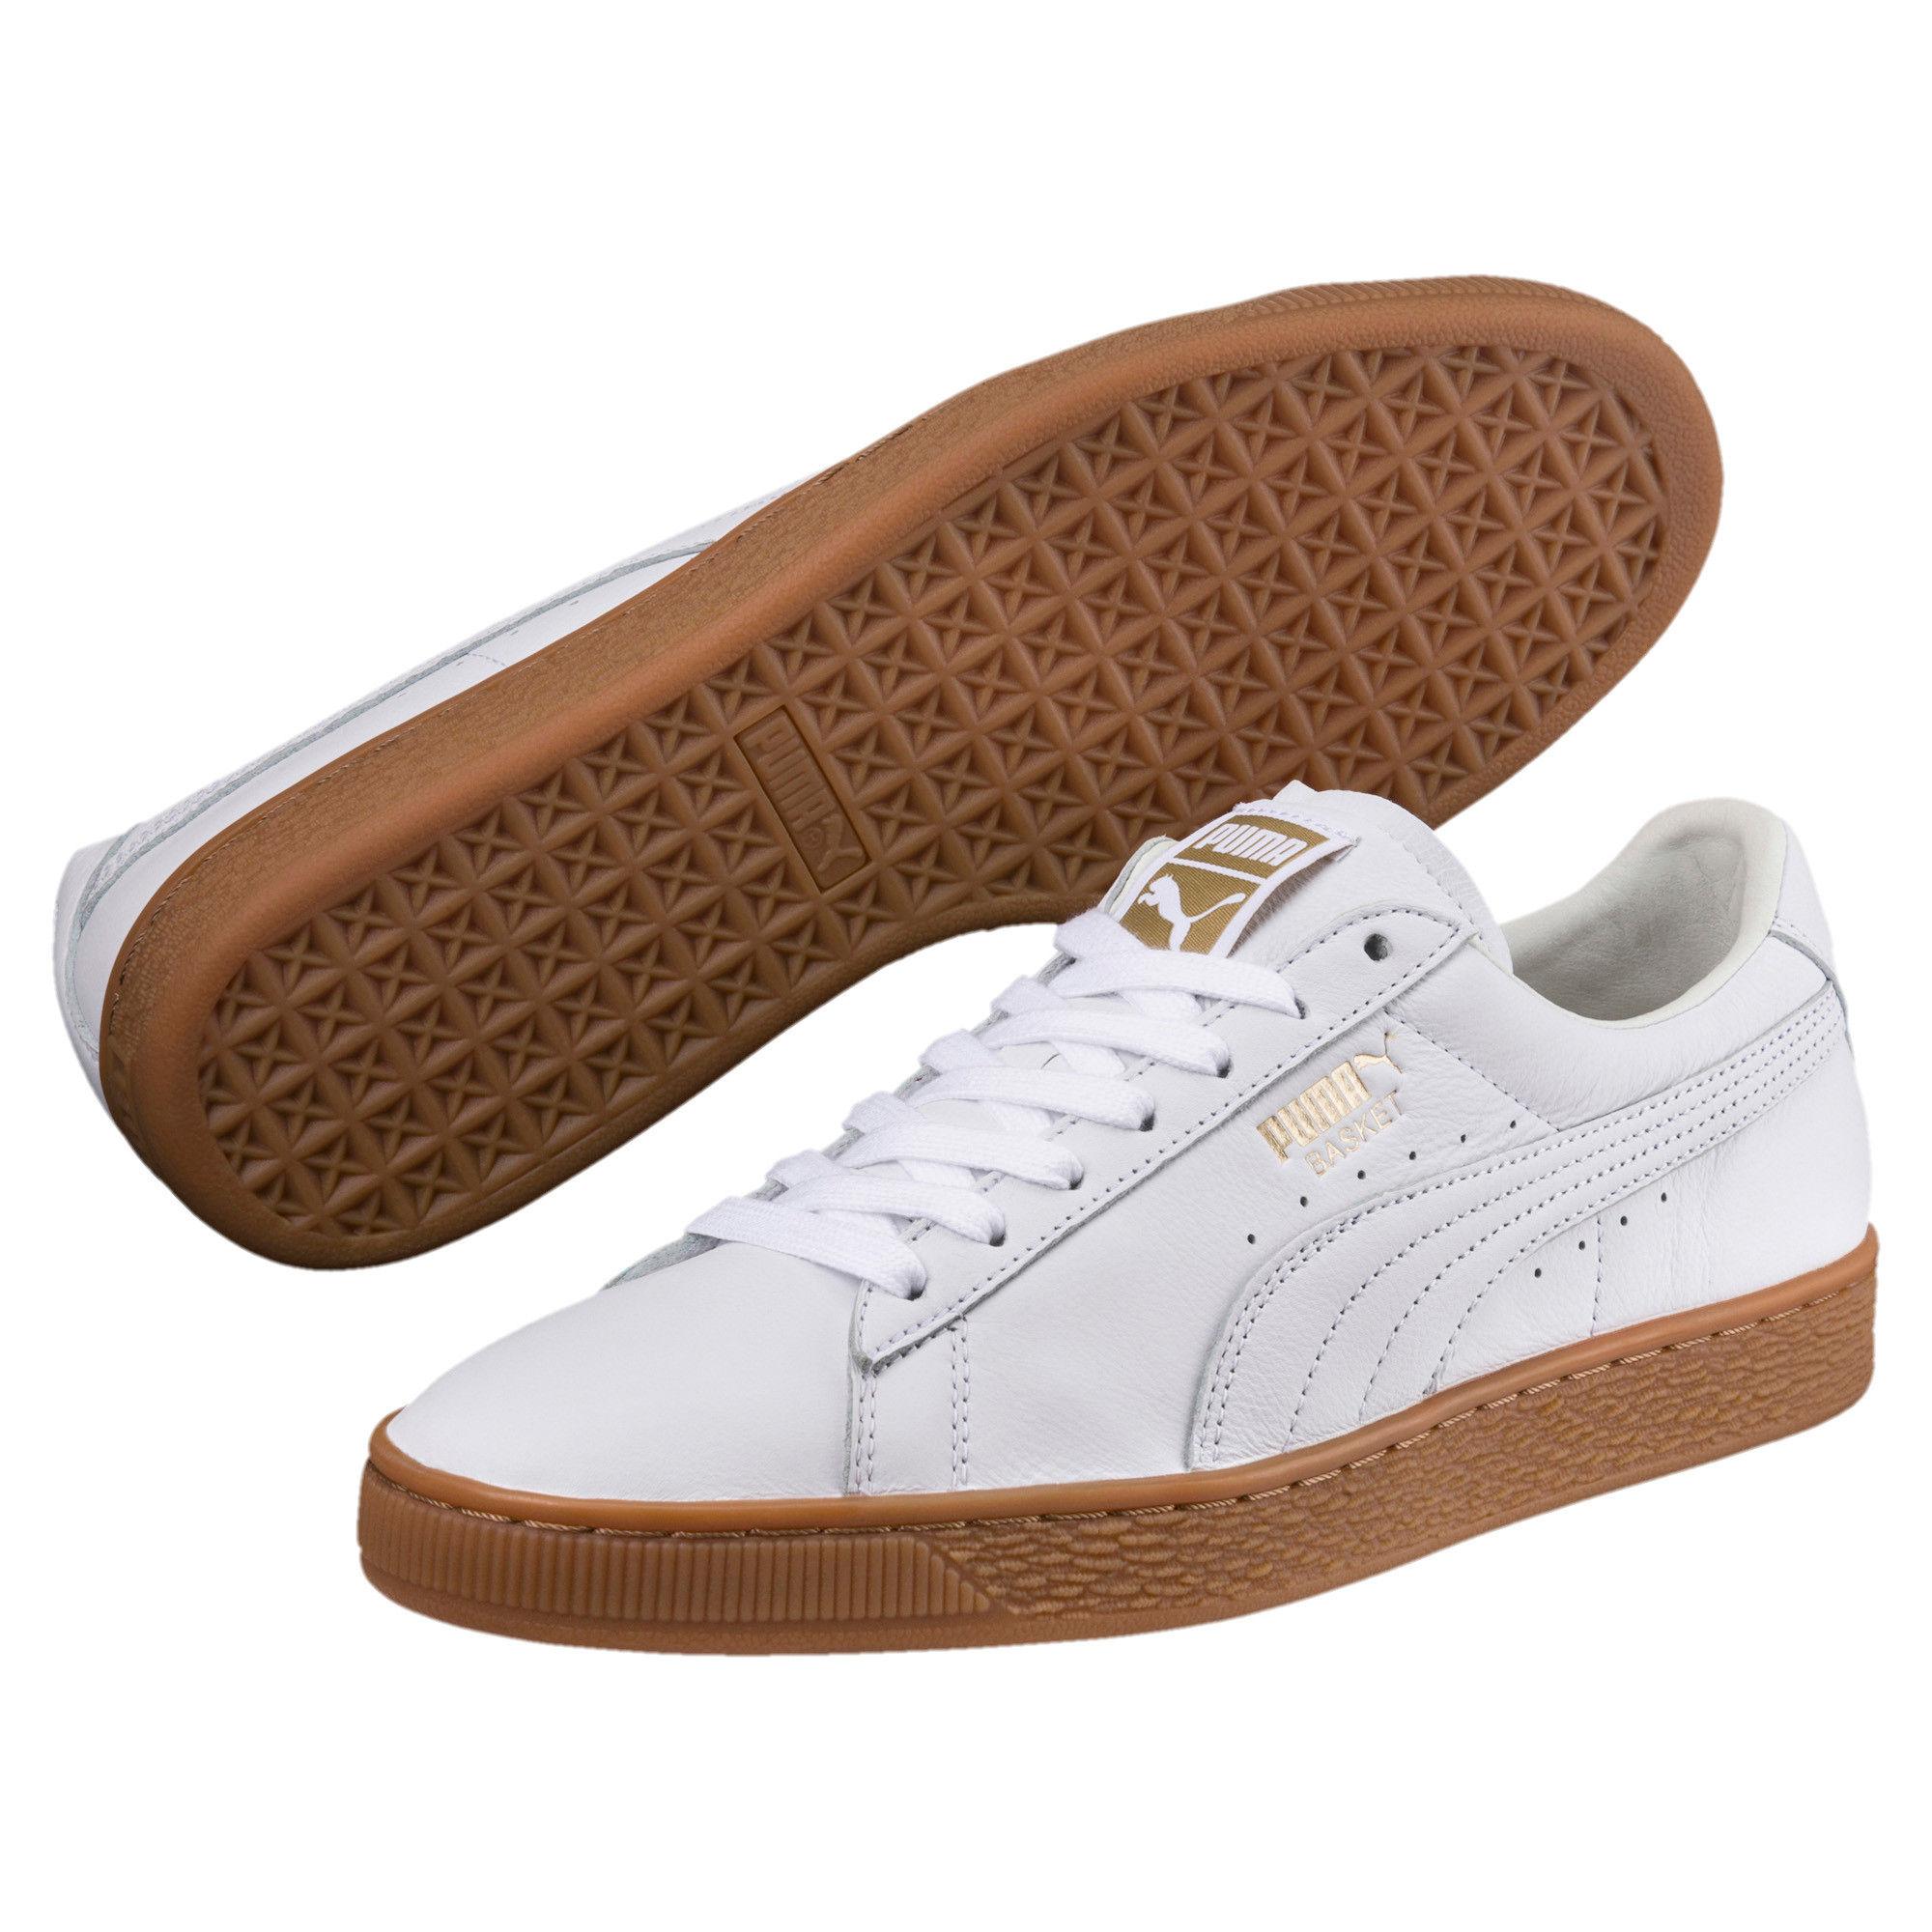 Academia Sensación Compulsión  Puma Basket Classic Gum Deluxe Unisex White Sneakers: Buy Puma Basket  Classic Gum Deluxe Unisex White Sneakers Online at Best Price in India |  Nykaa